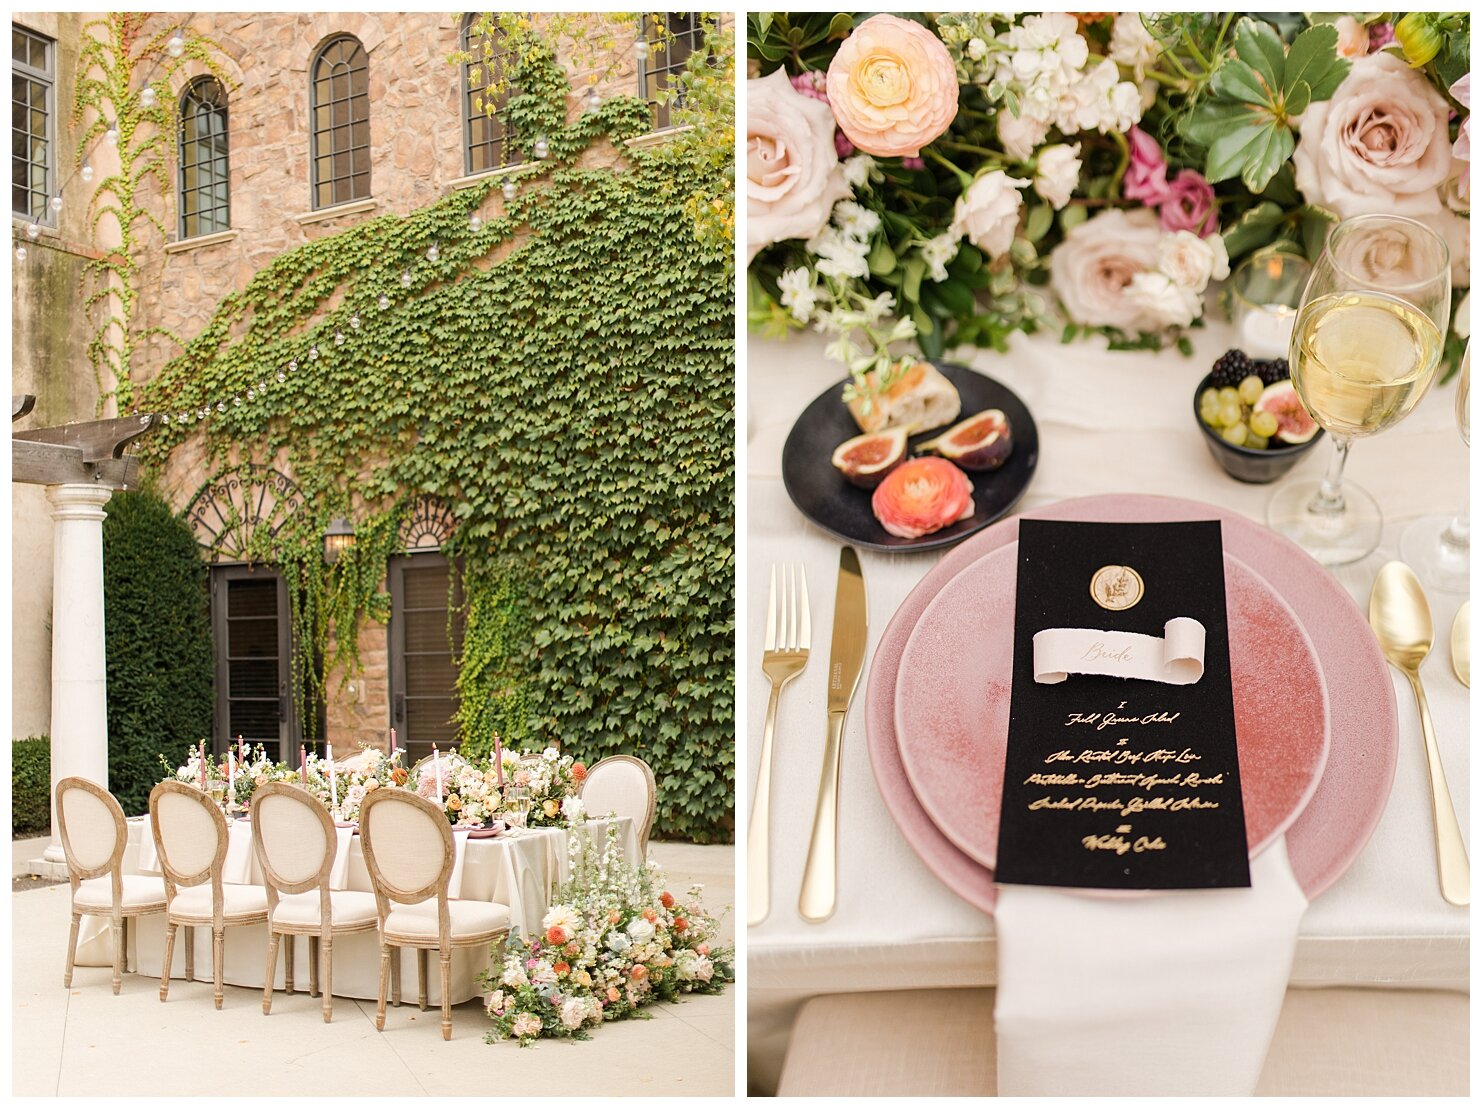 club-corazon-columbus-wedding-photography_0018.jpg